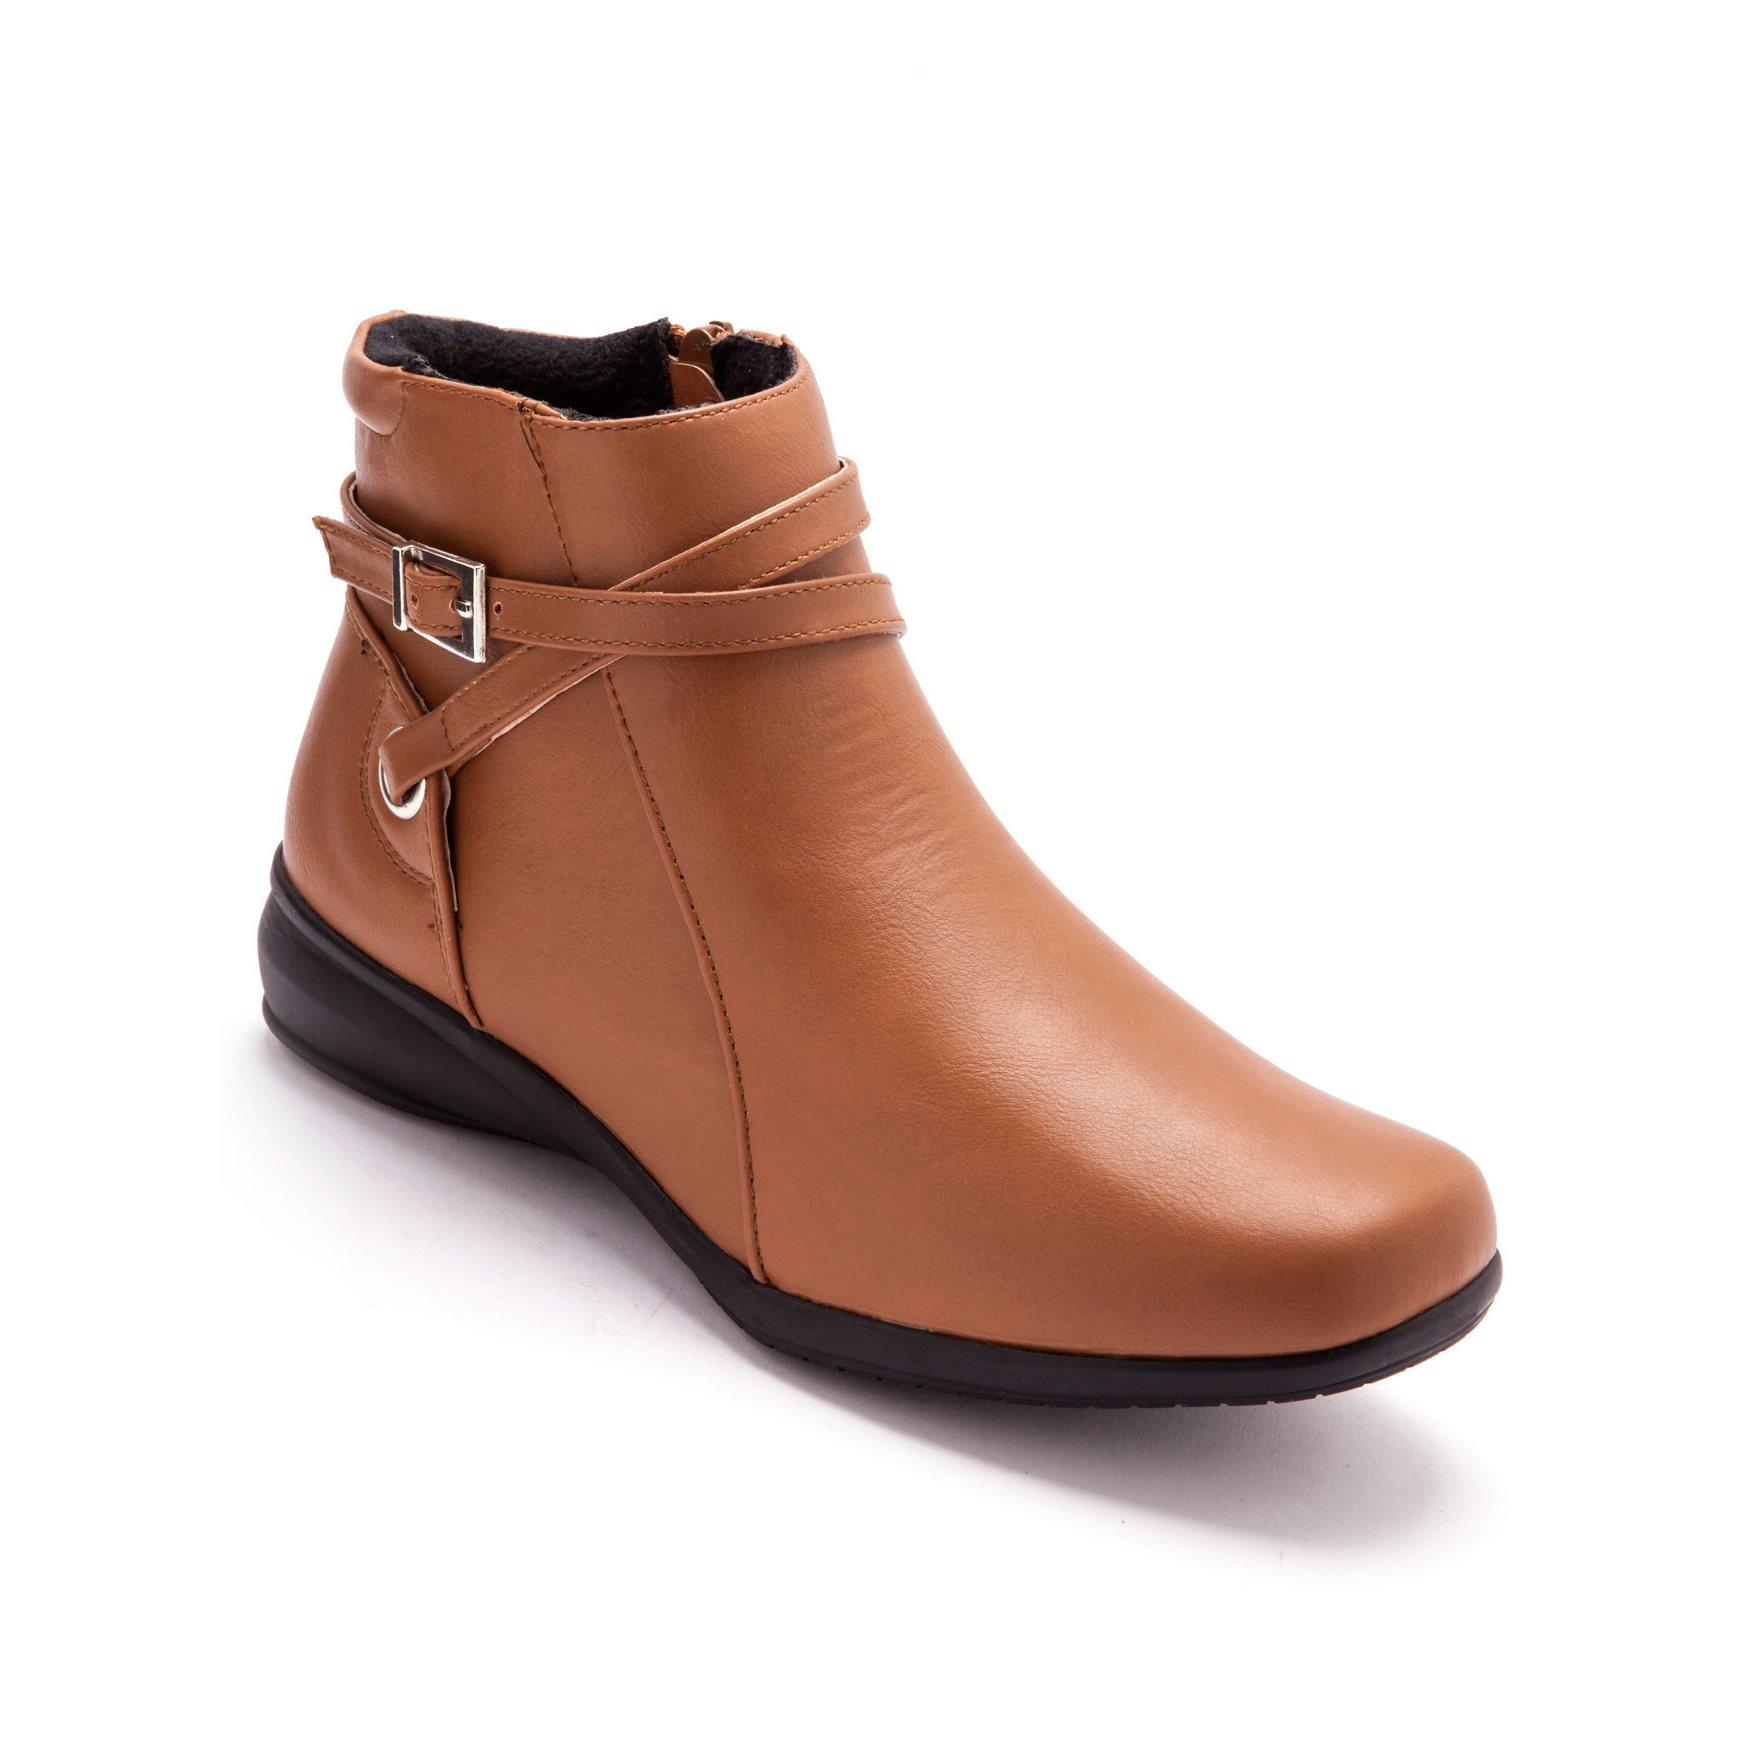 Boots felpati all'interno, cinturino fantasia -$67.90